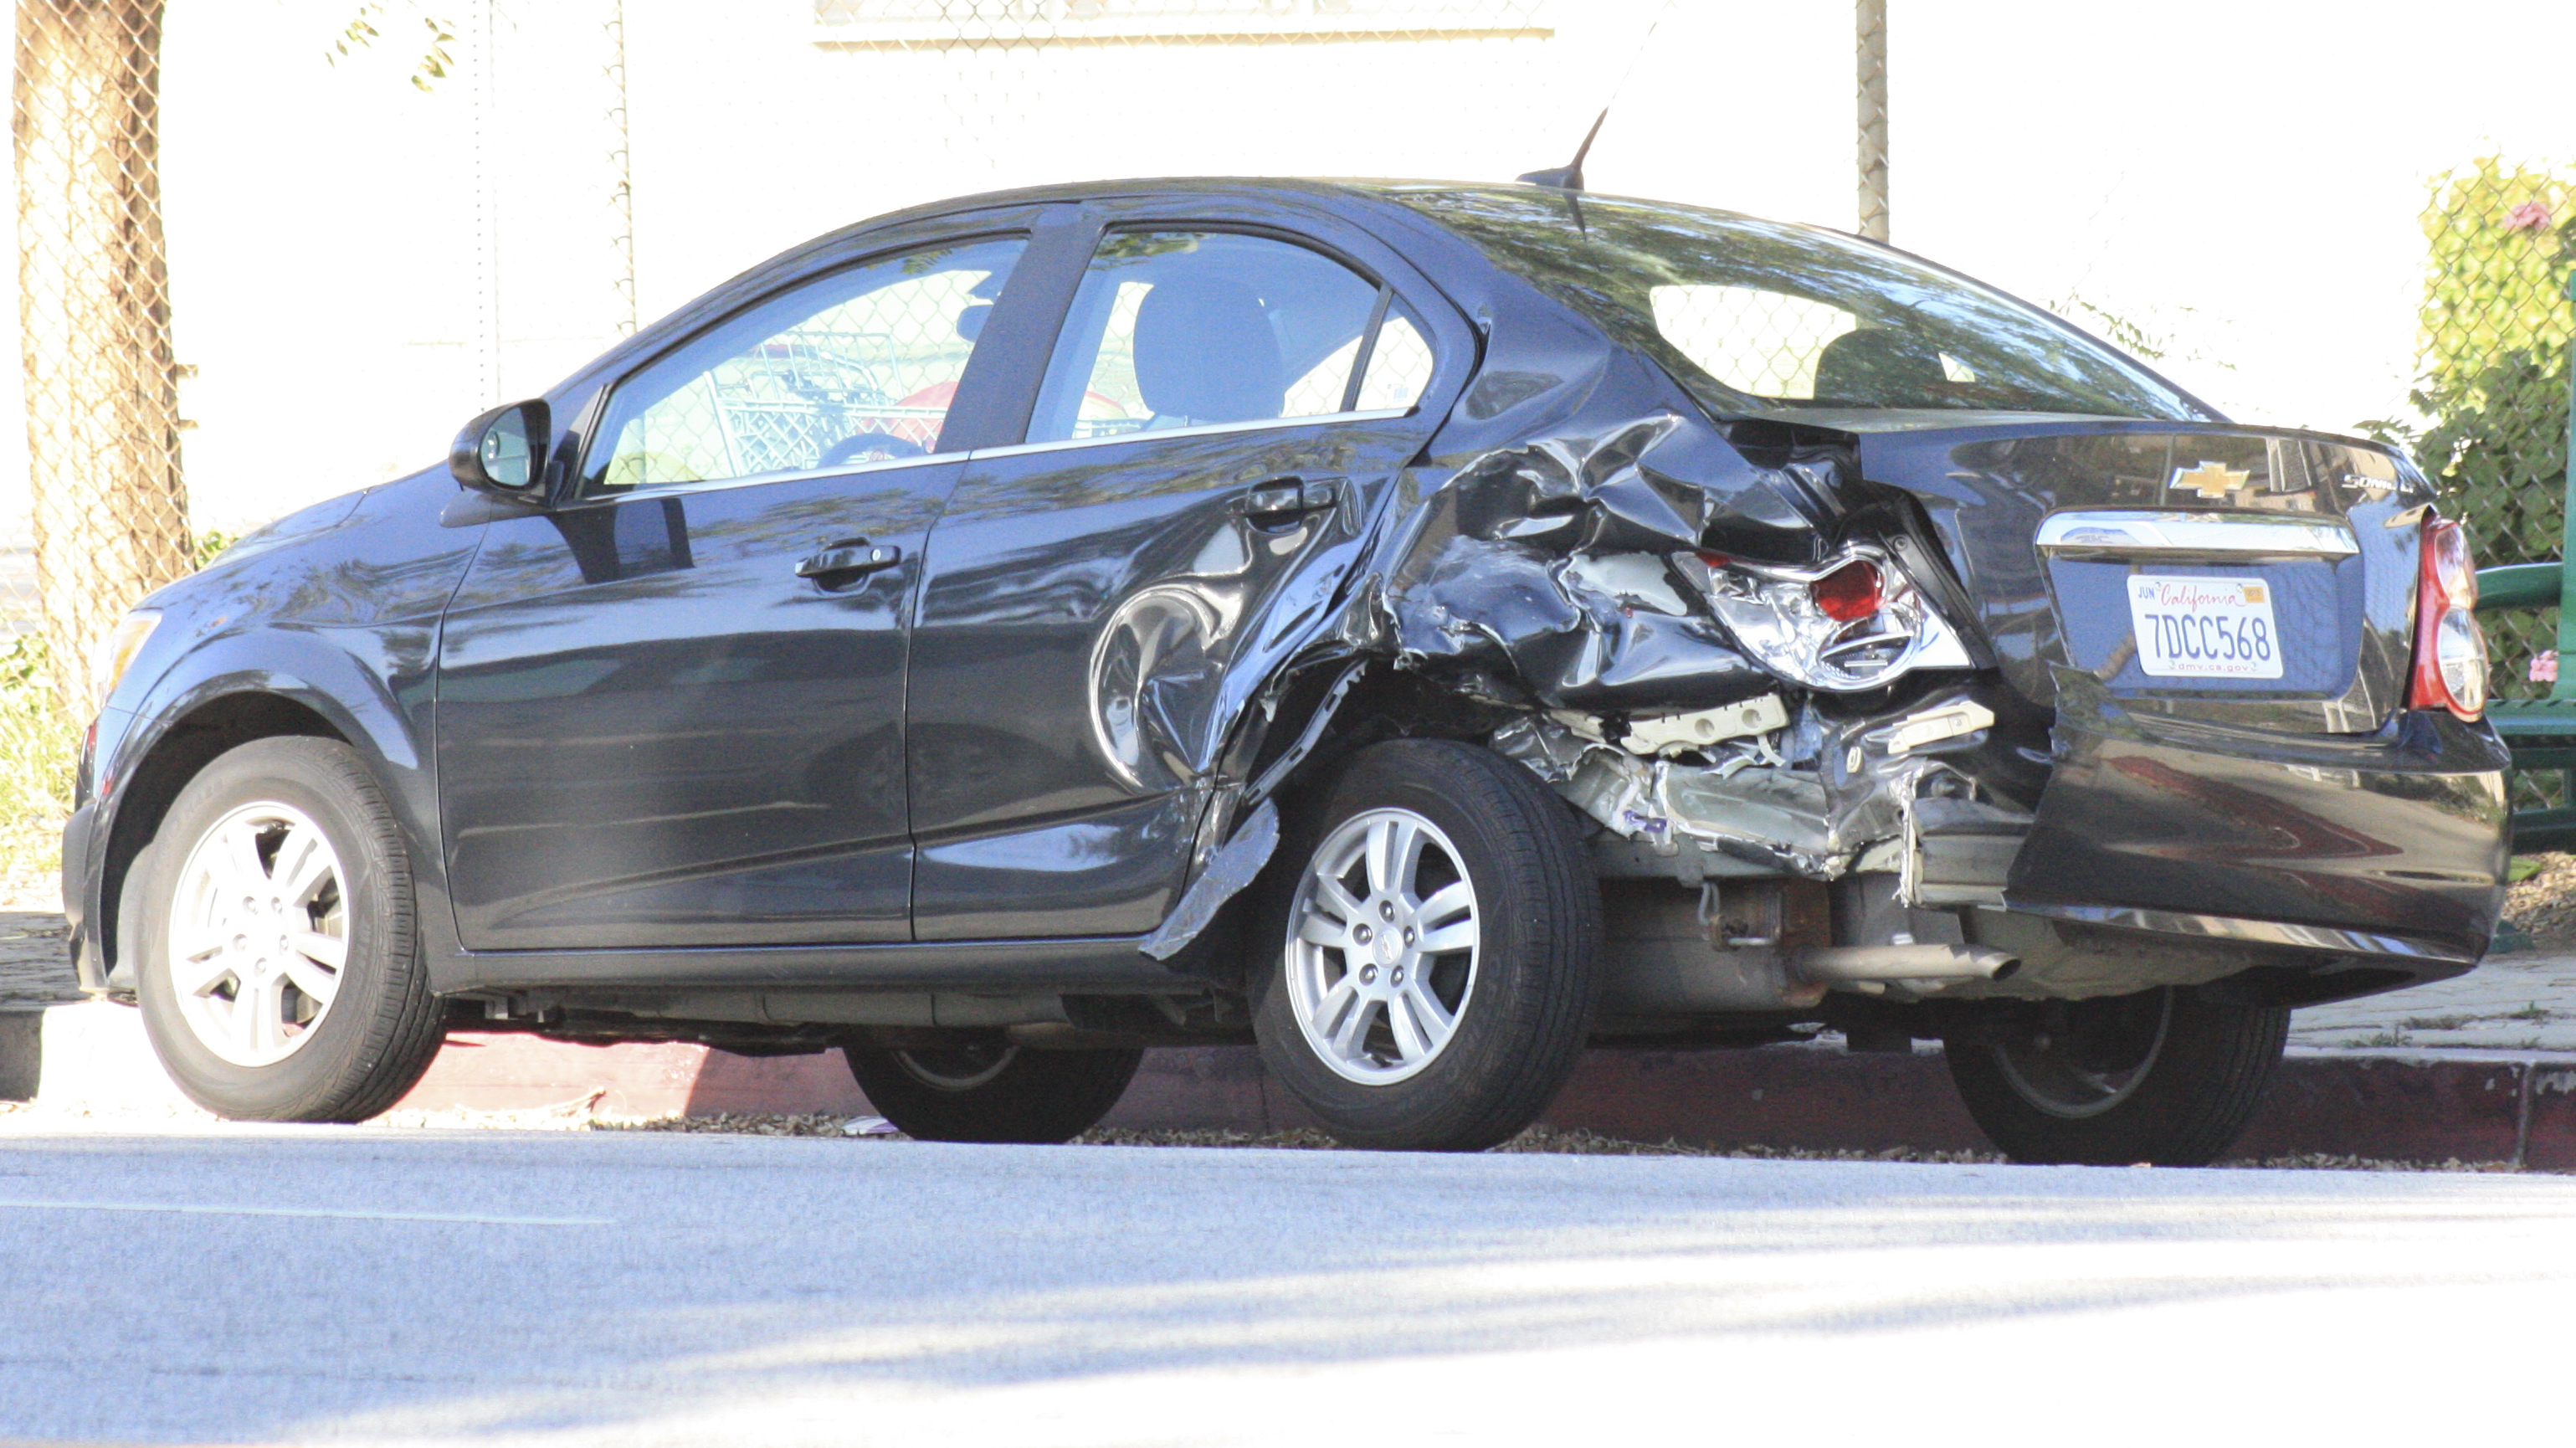 Accident at Pierce's Winnetka entrance